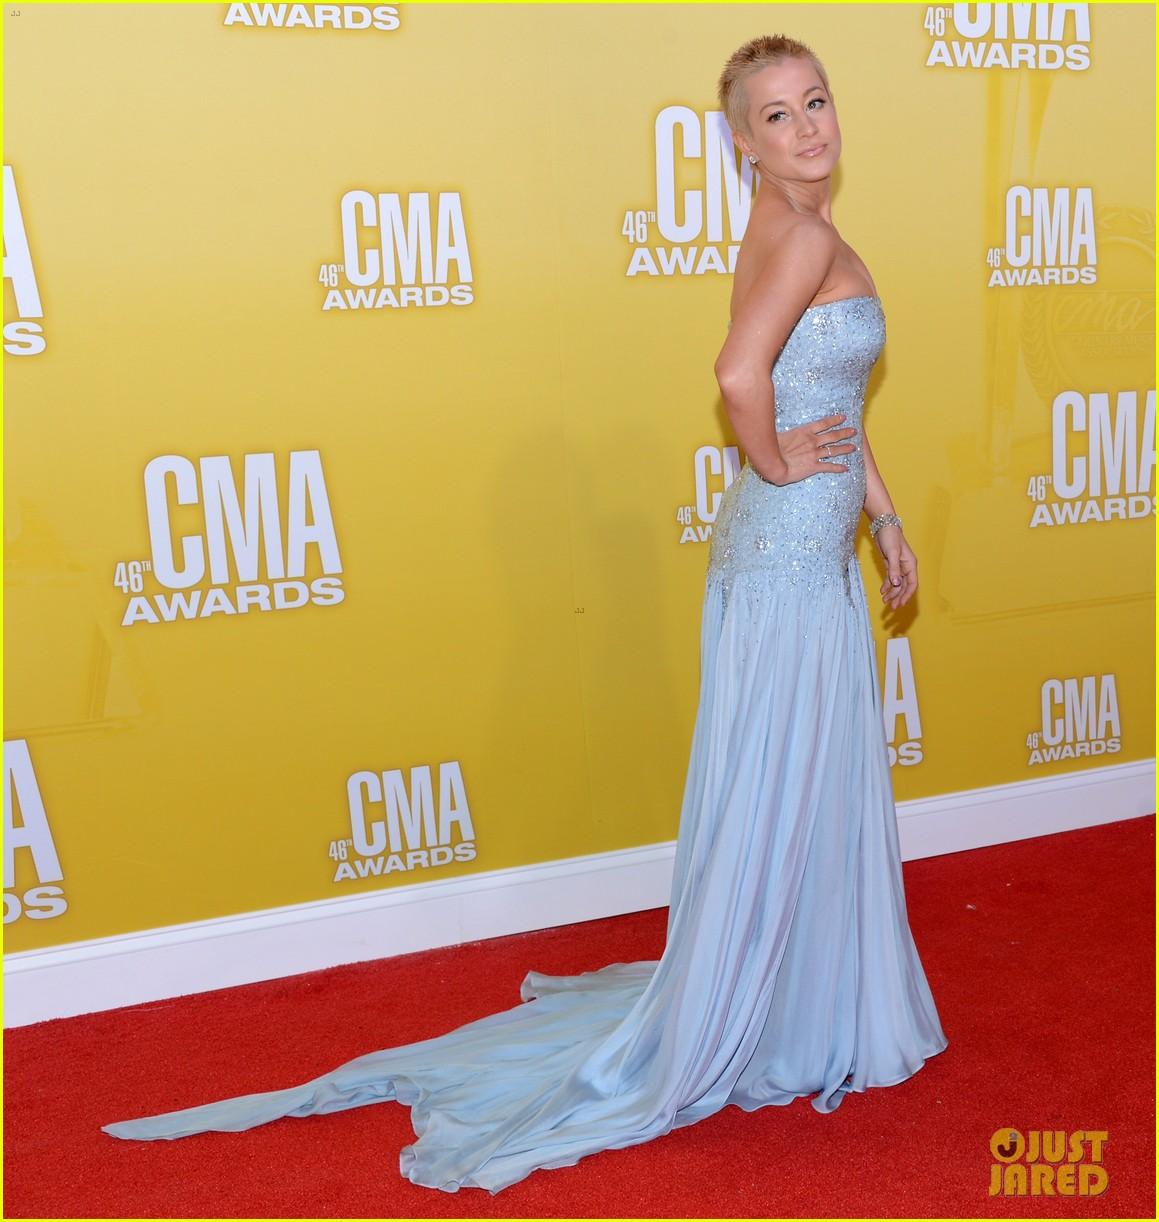 Kellie Pickler CMA Awards 2012 Red Carpet Photo 2749675